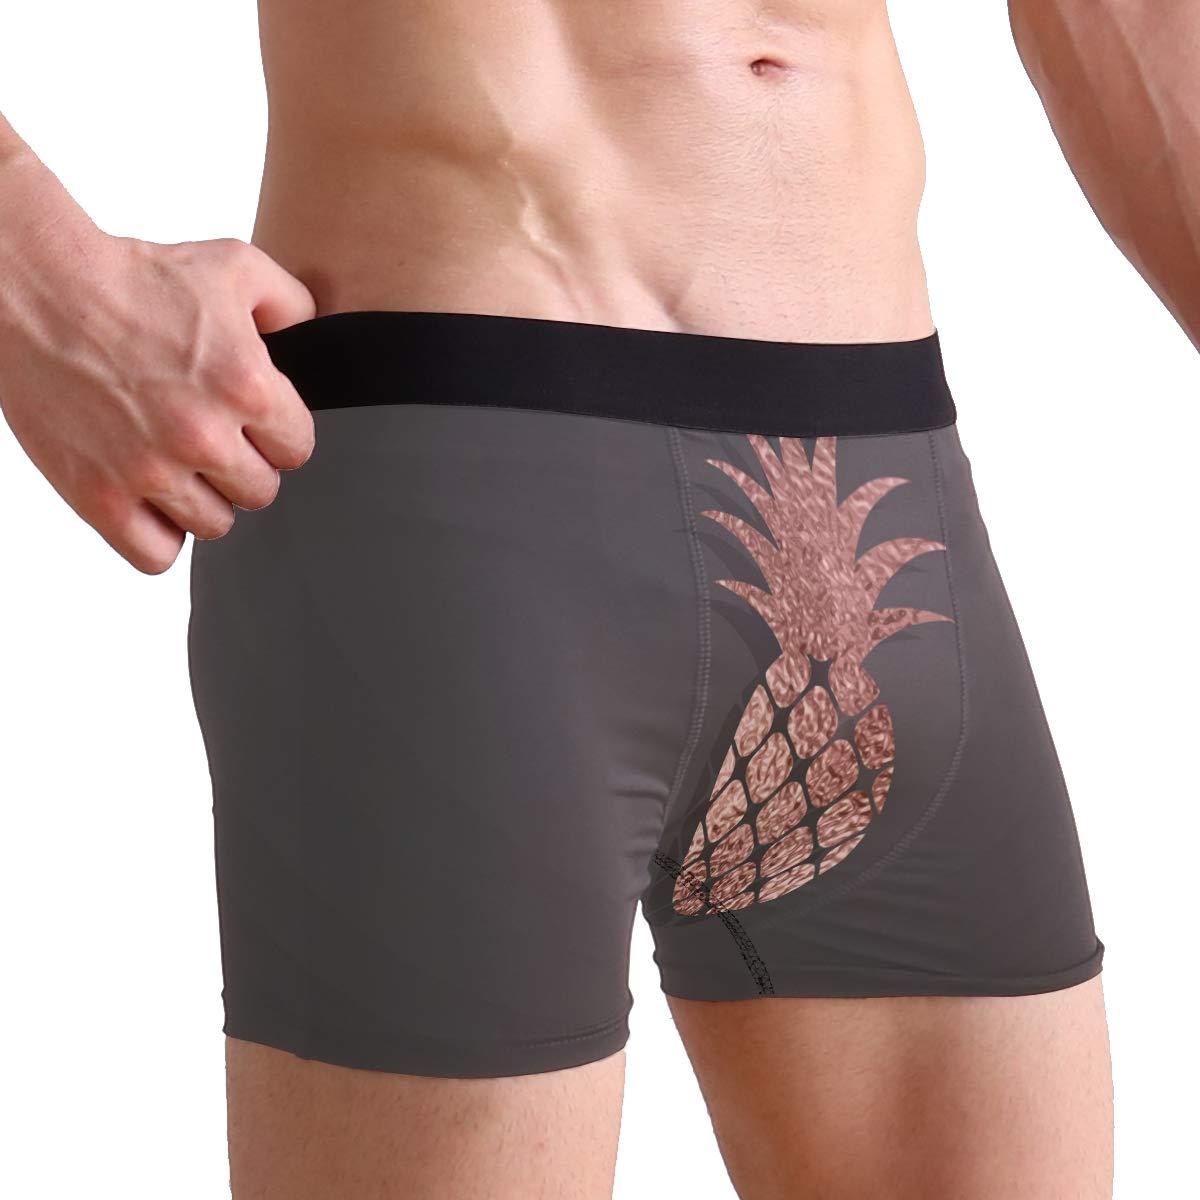 BETTKEN Mens Boxer Briefs Tropical Fuit Pineapple Print Short Underwear Soft Stretch Underpants for Men Boys S-XL